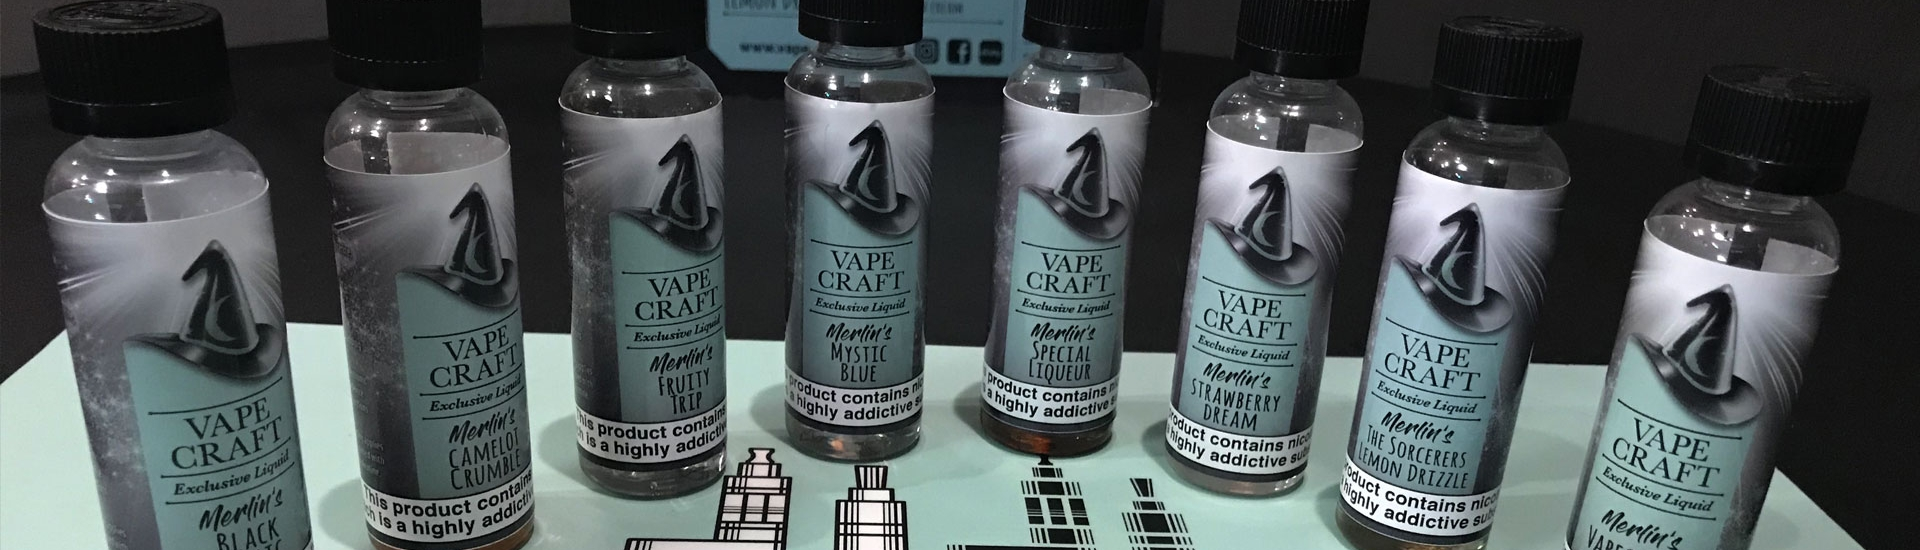 Vape Craft Liquids